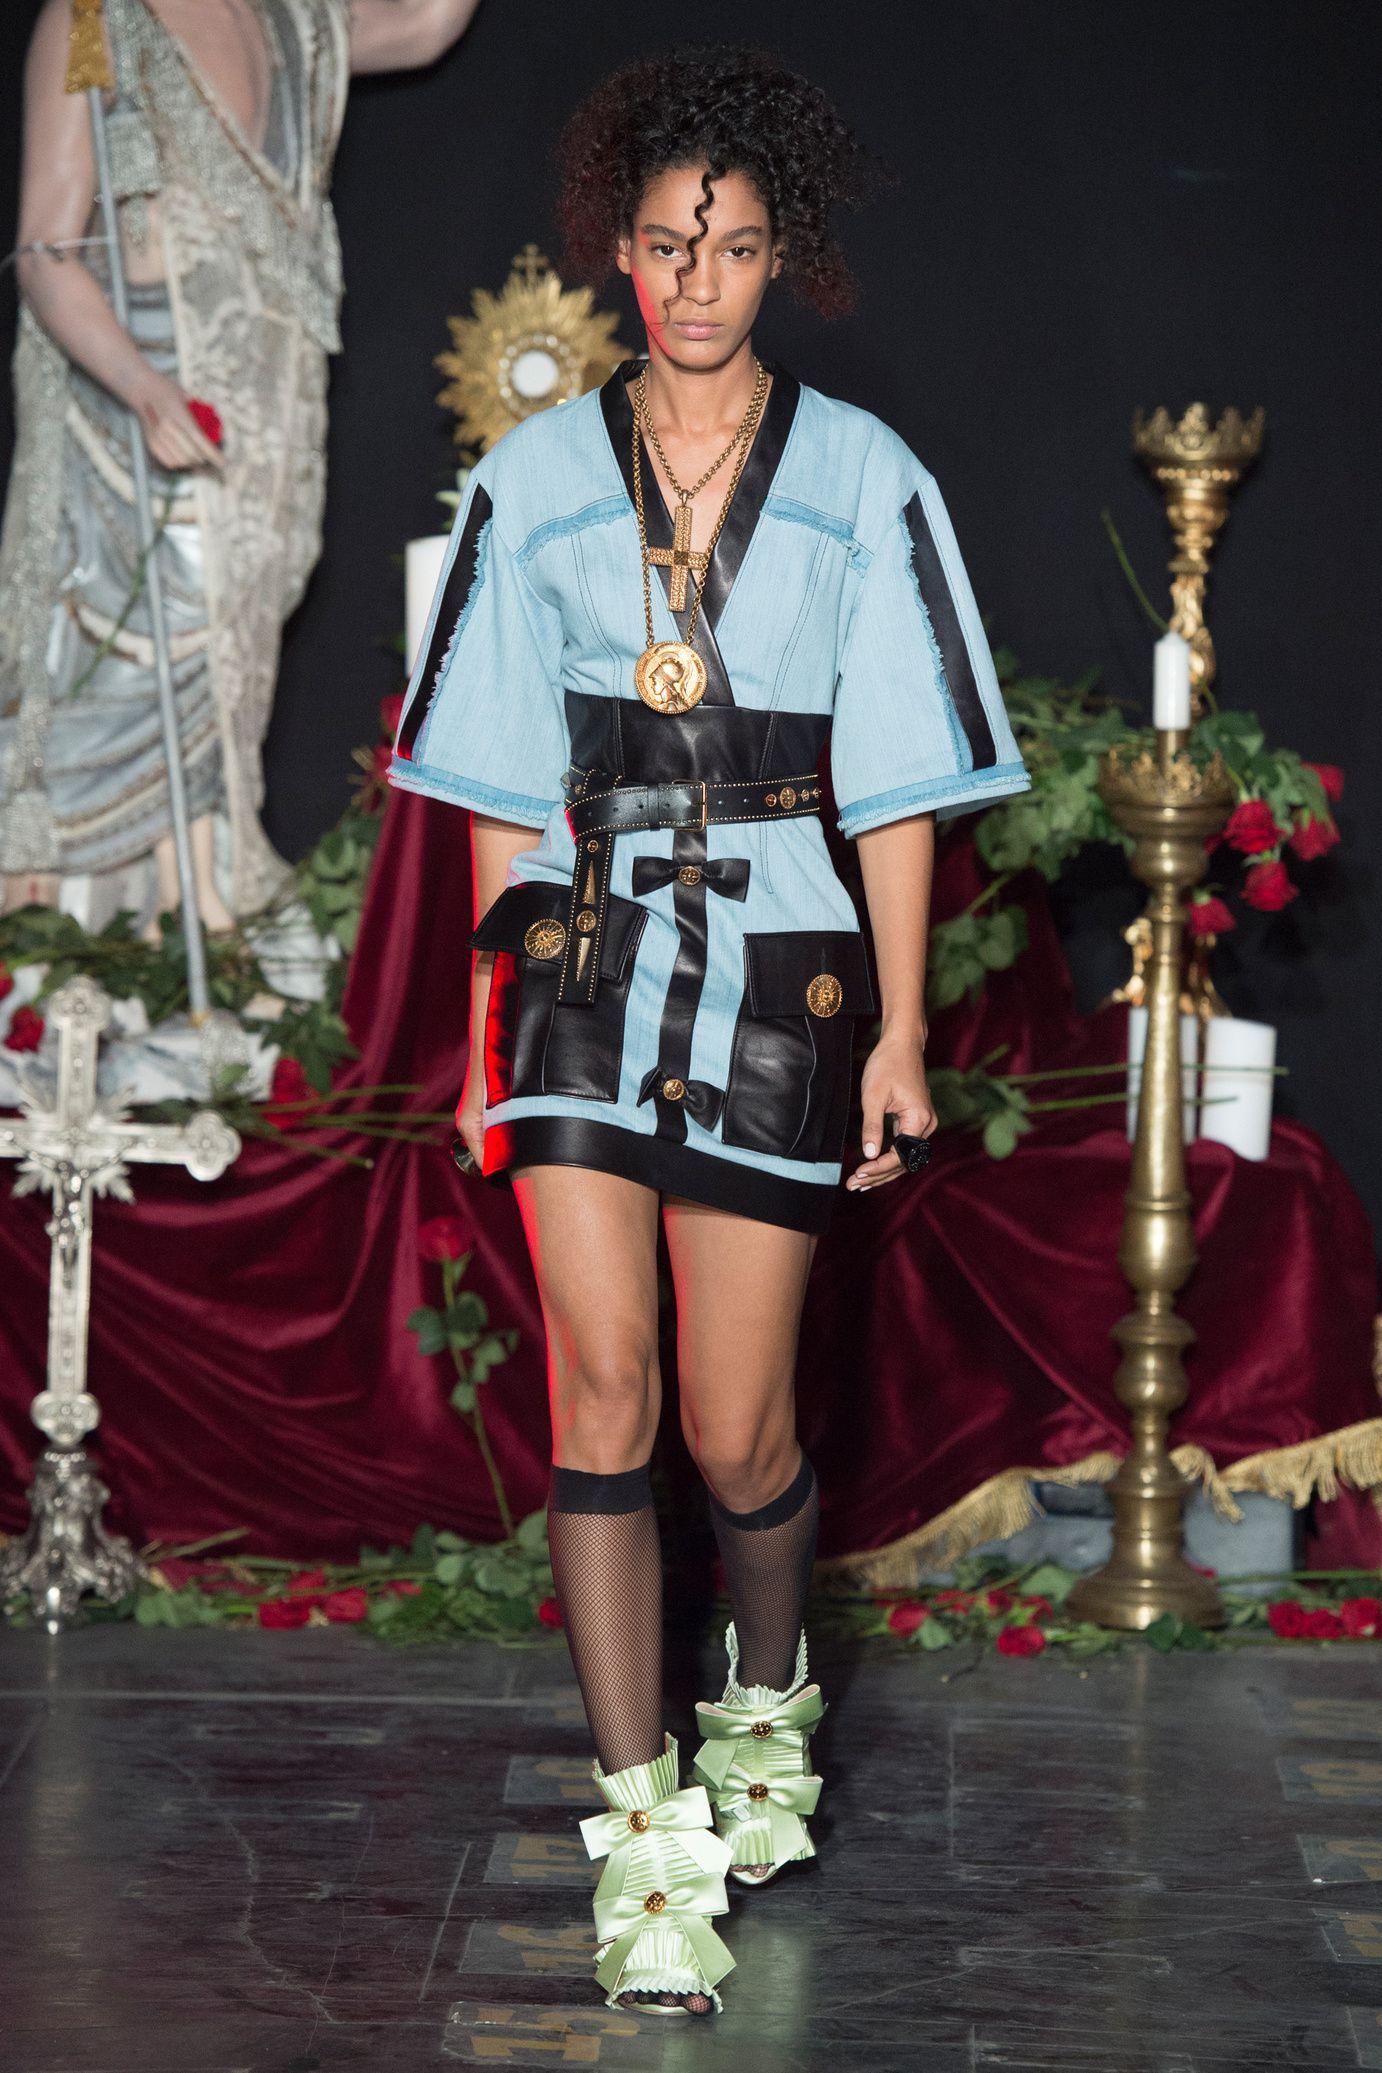 Pin su Backstage at Moschino Fall Winter 2017 fashion show